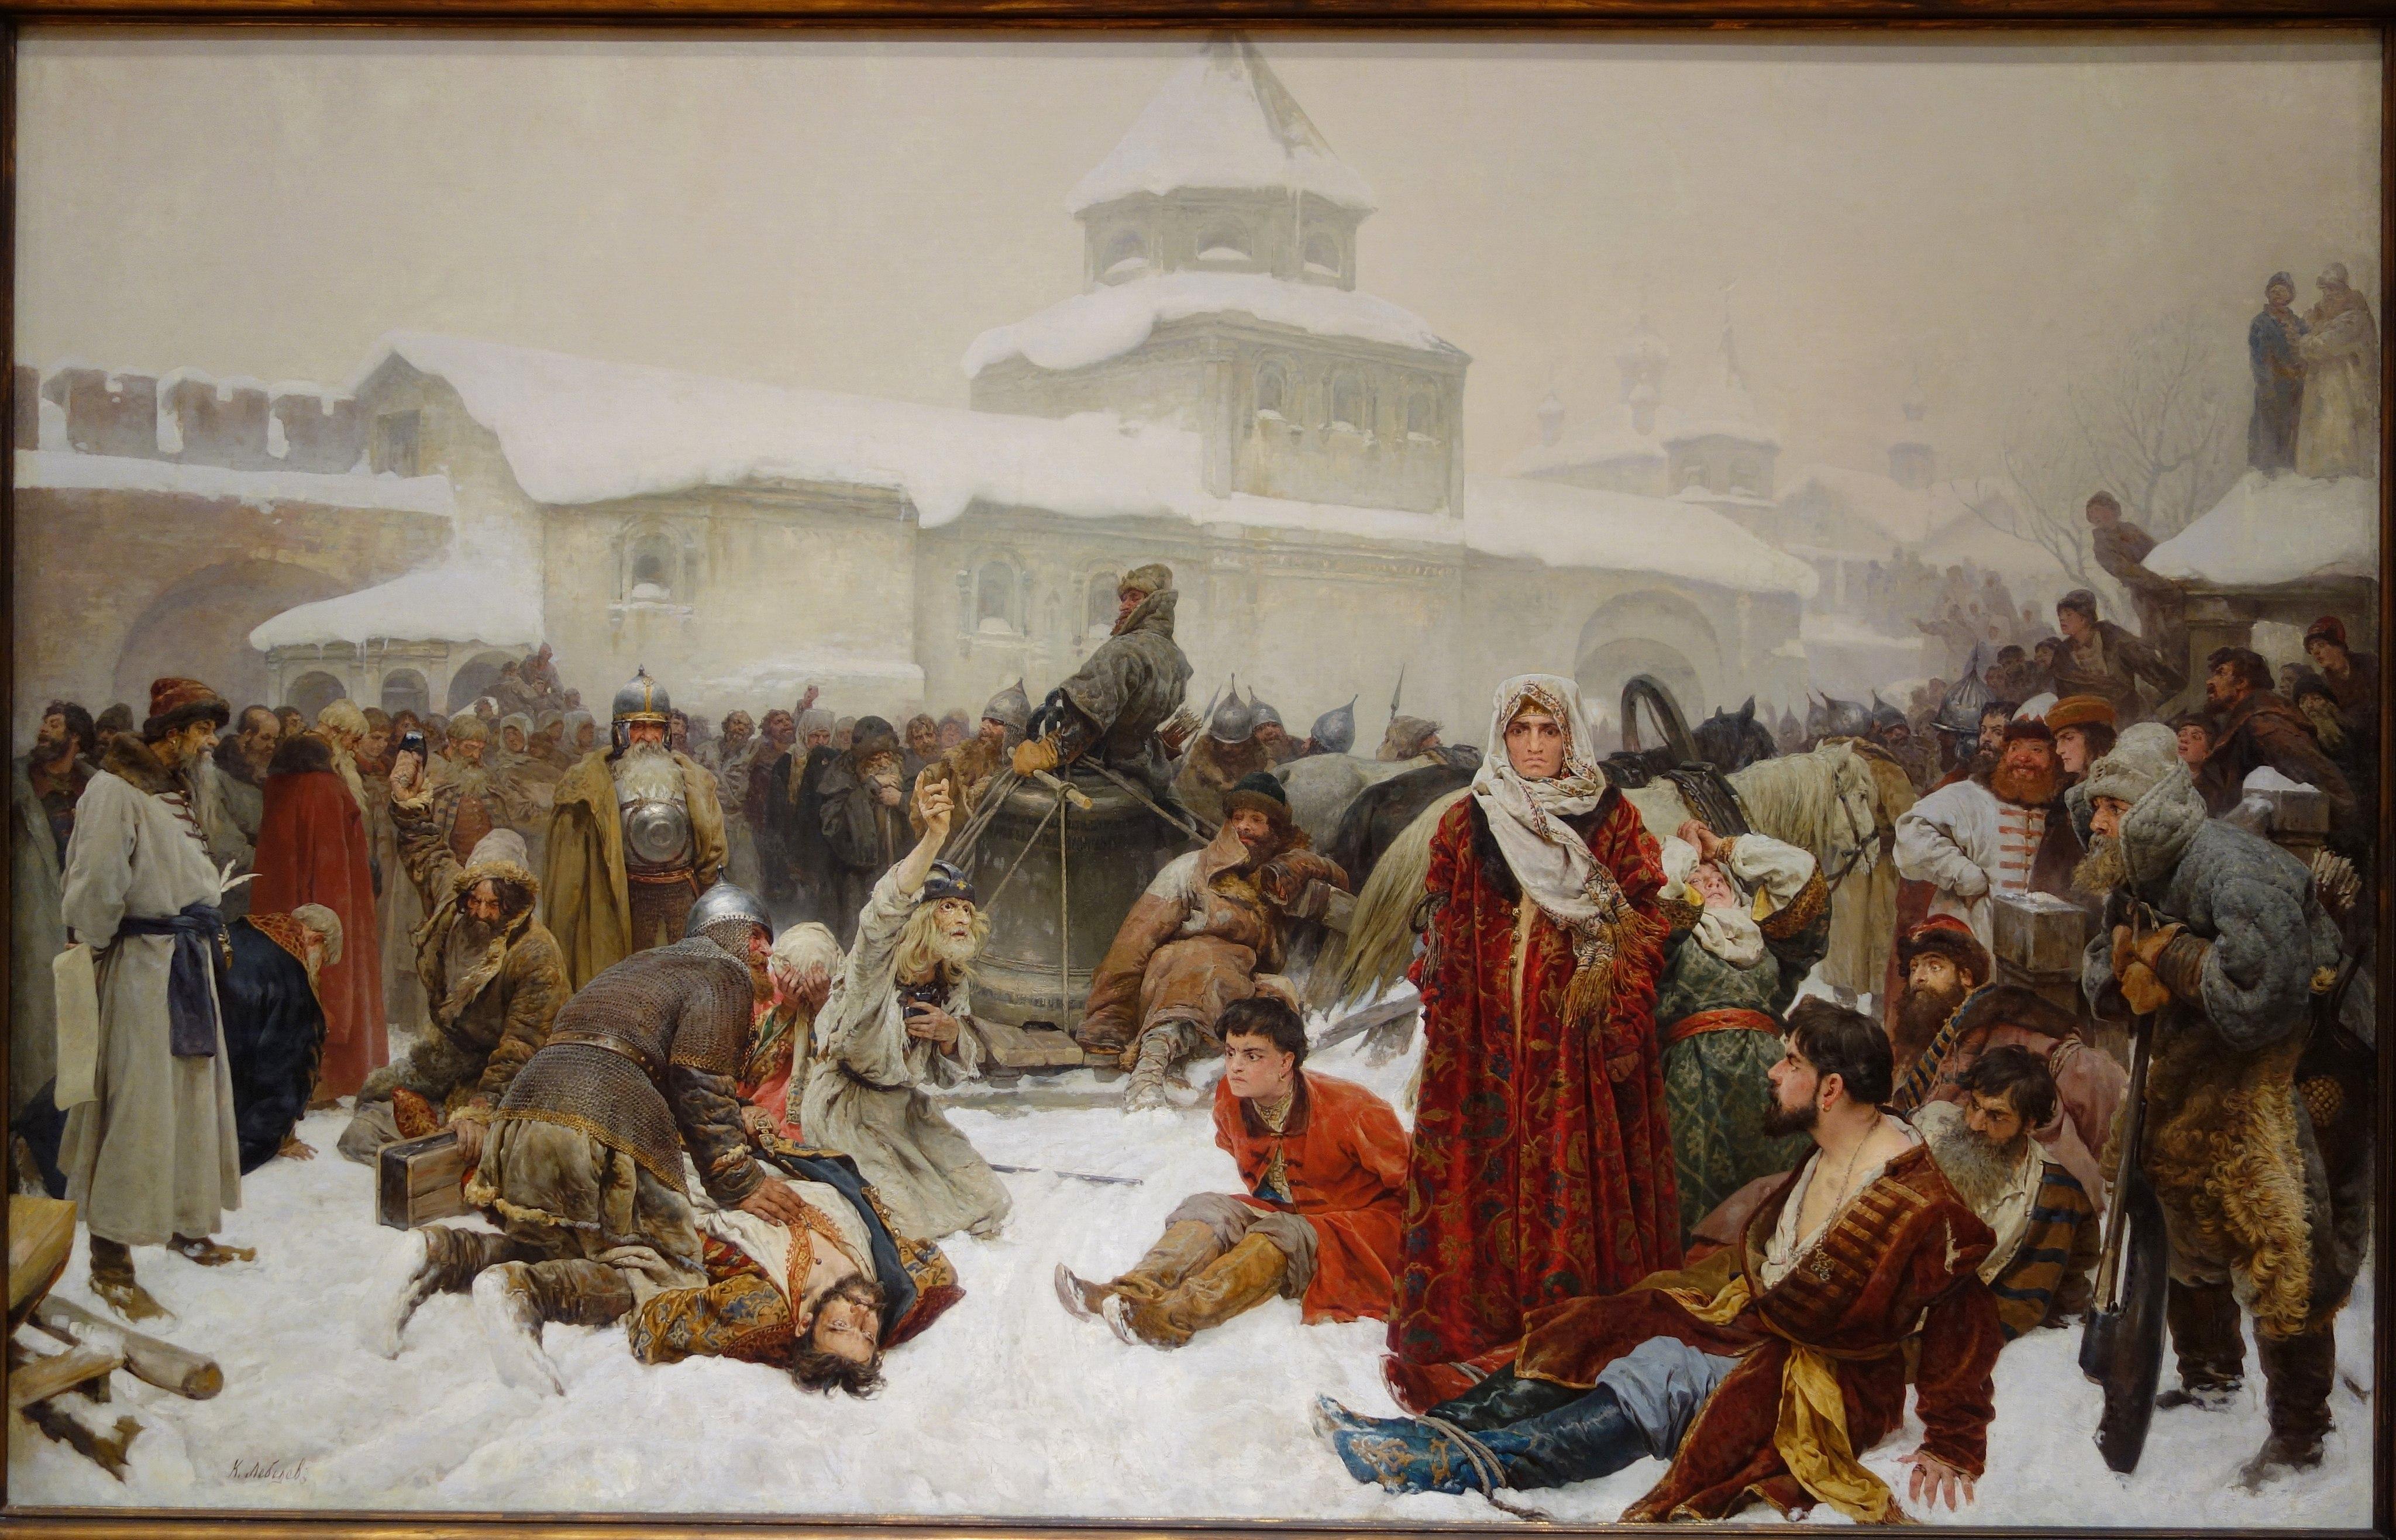 Lebedev's The Fall of Novgorod.